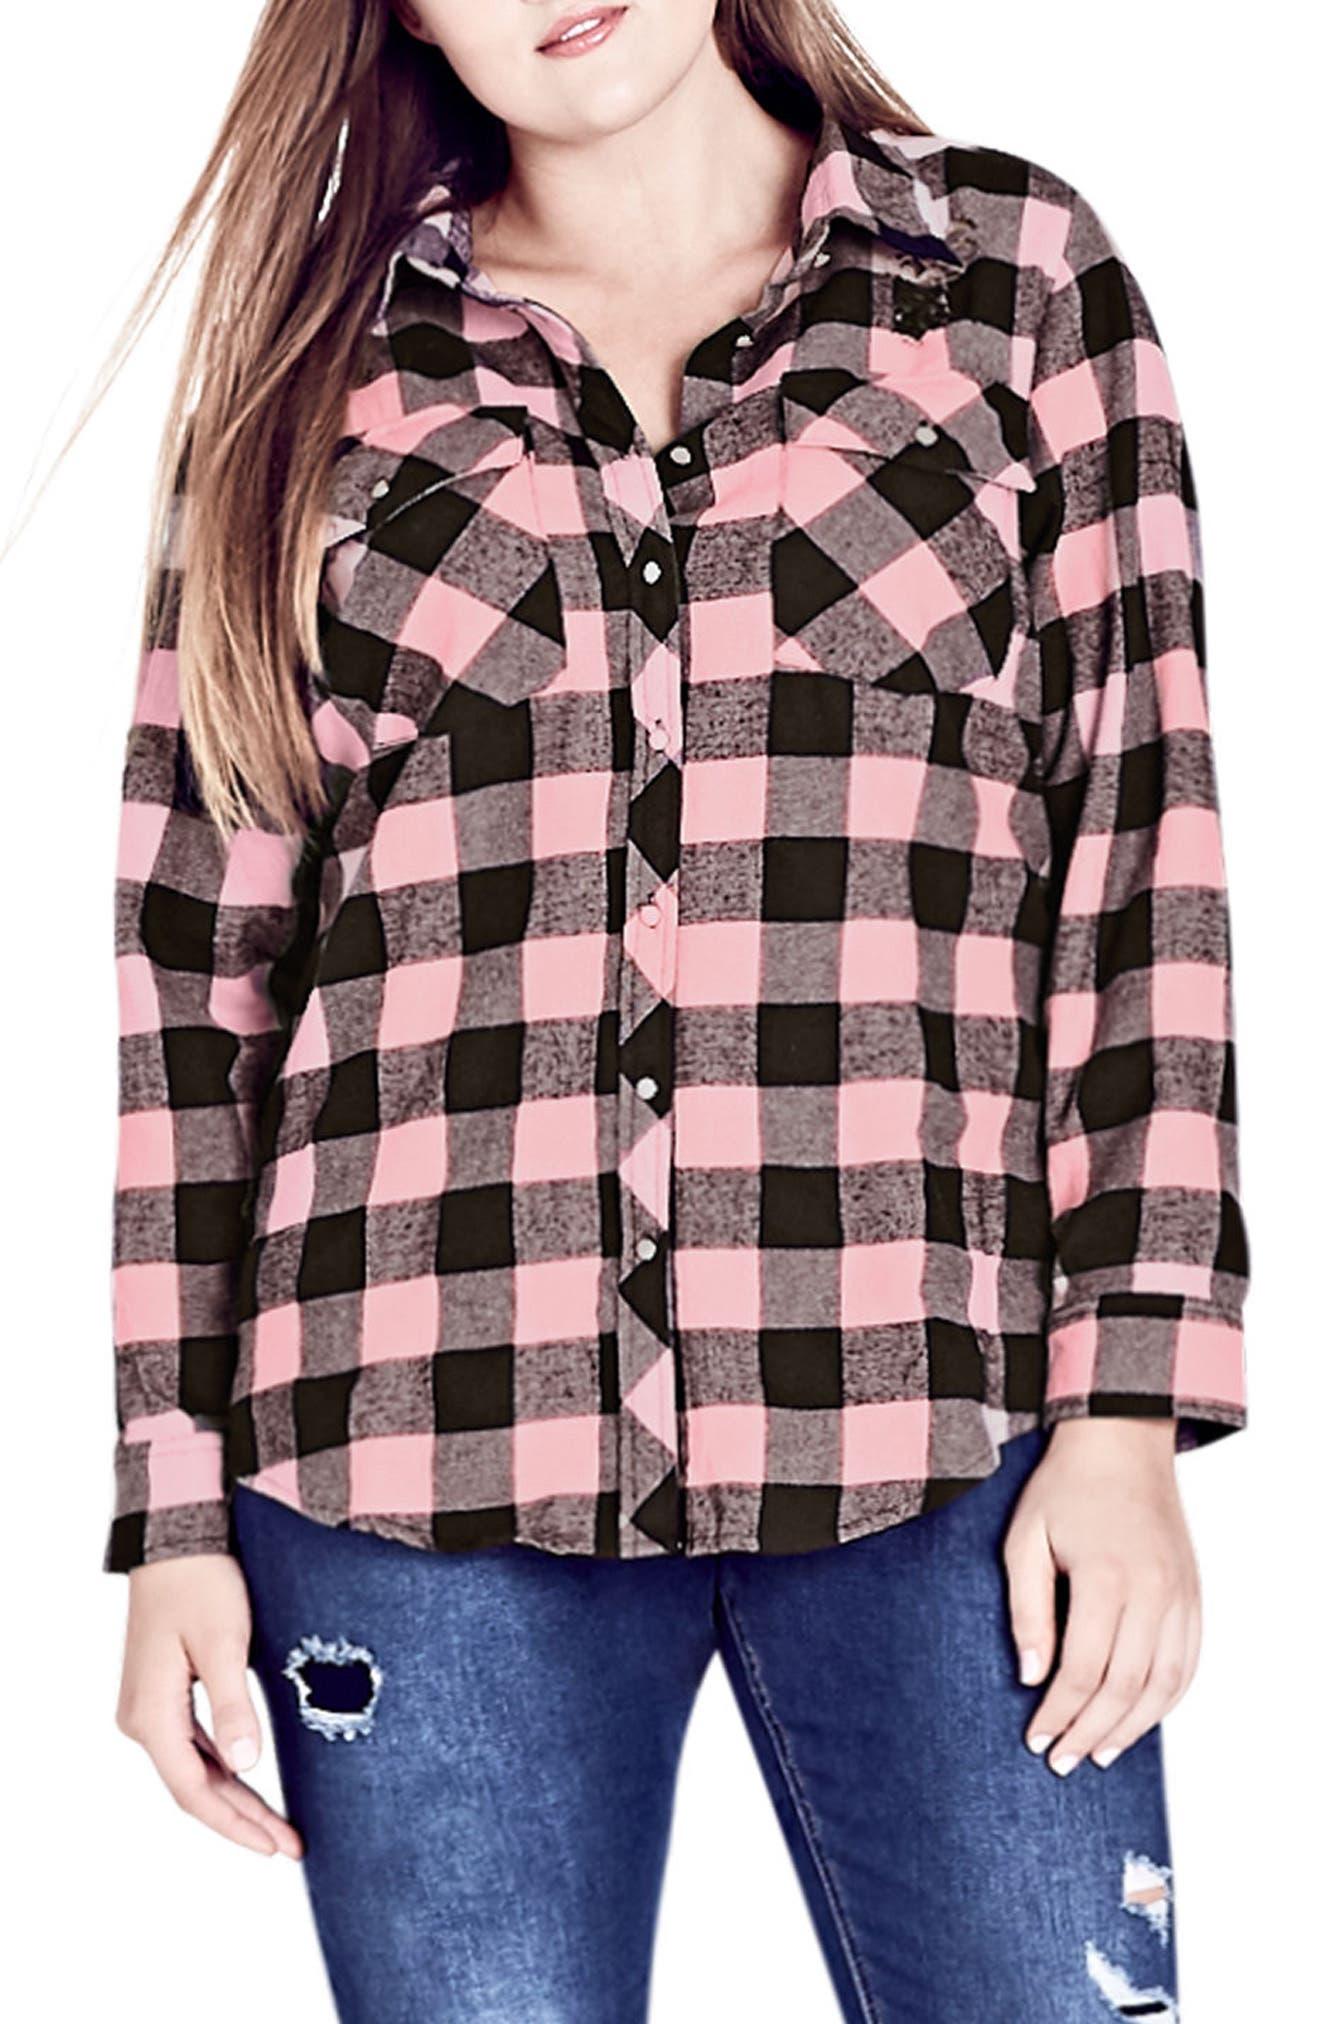 Dusty Duke Cotton Shirt,                         Main,                         color, Blush Pink